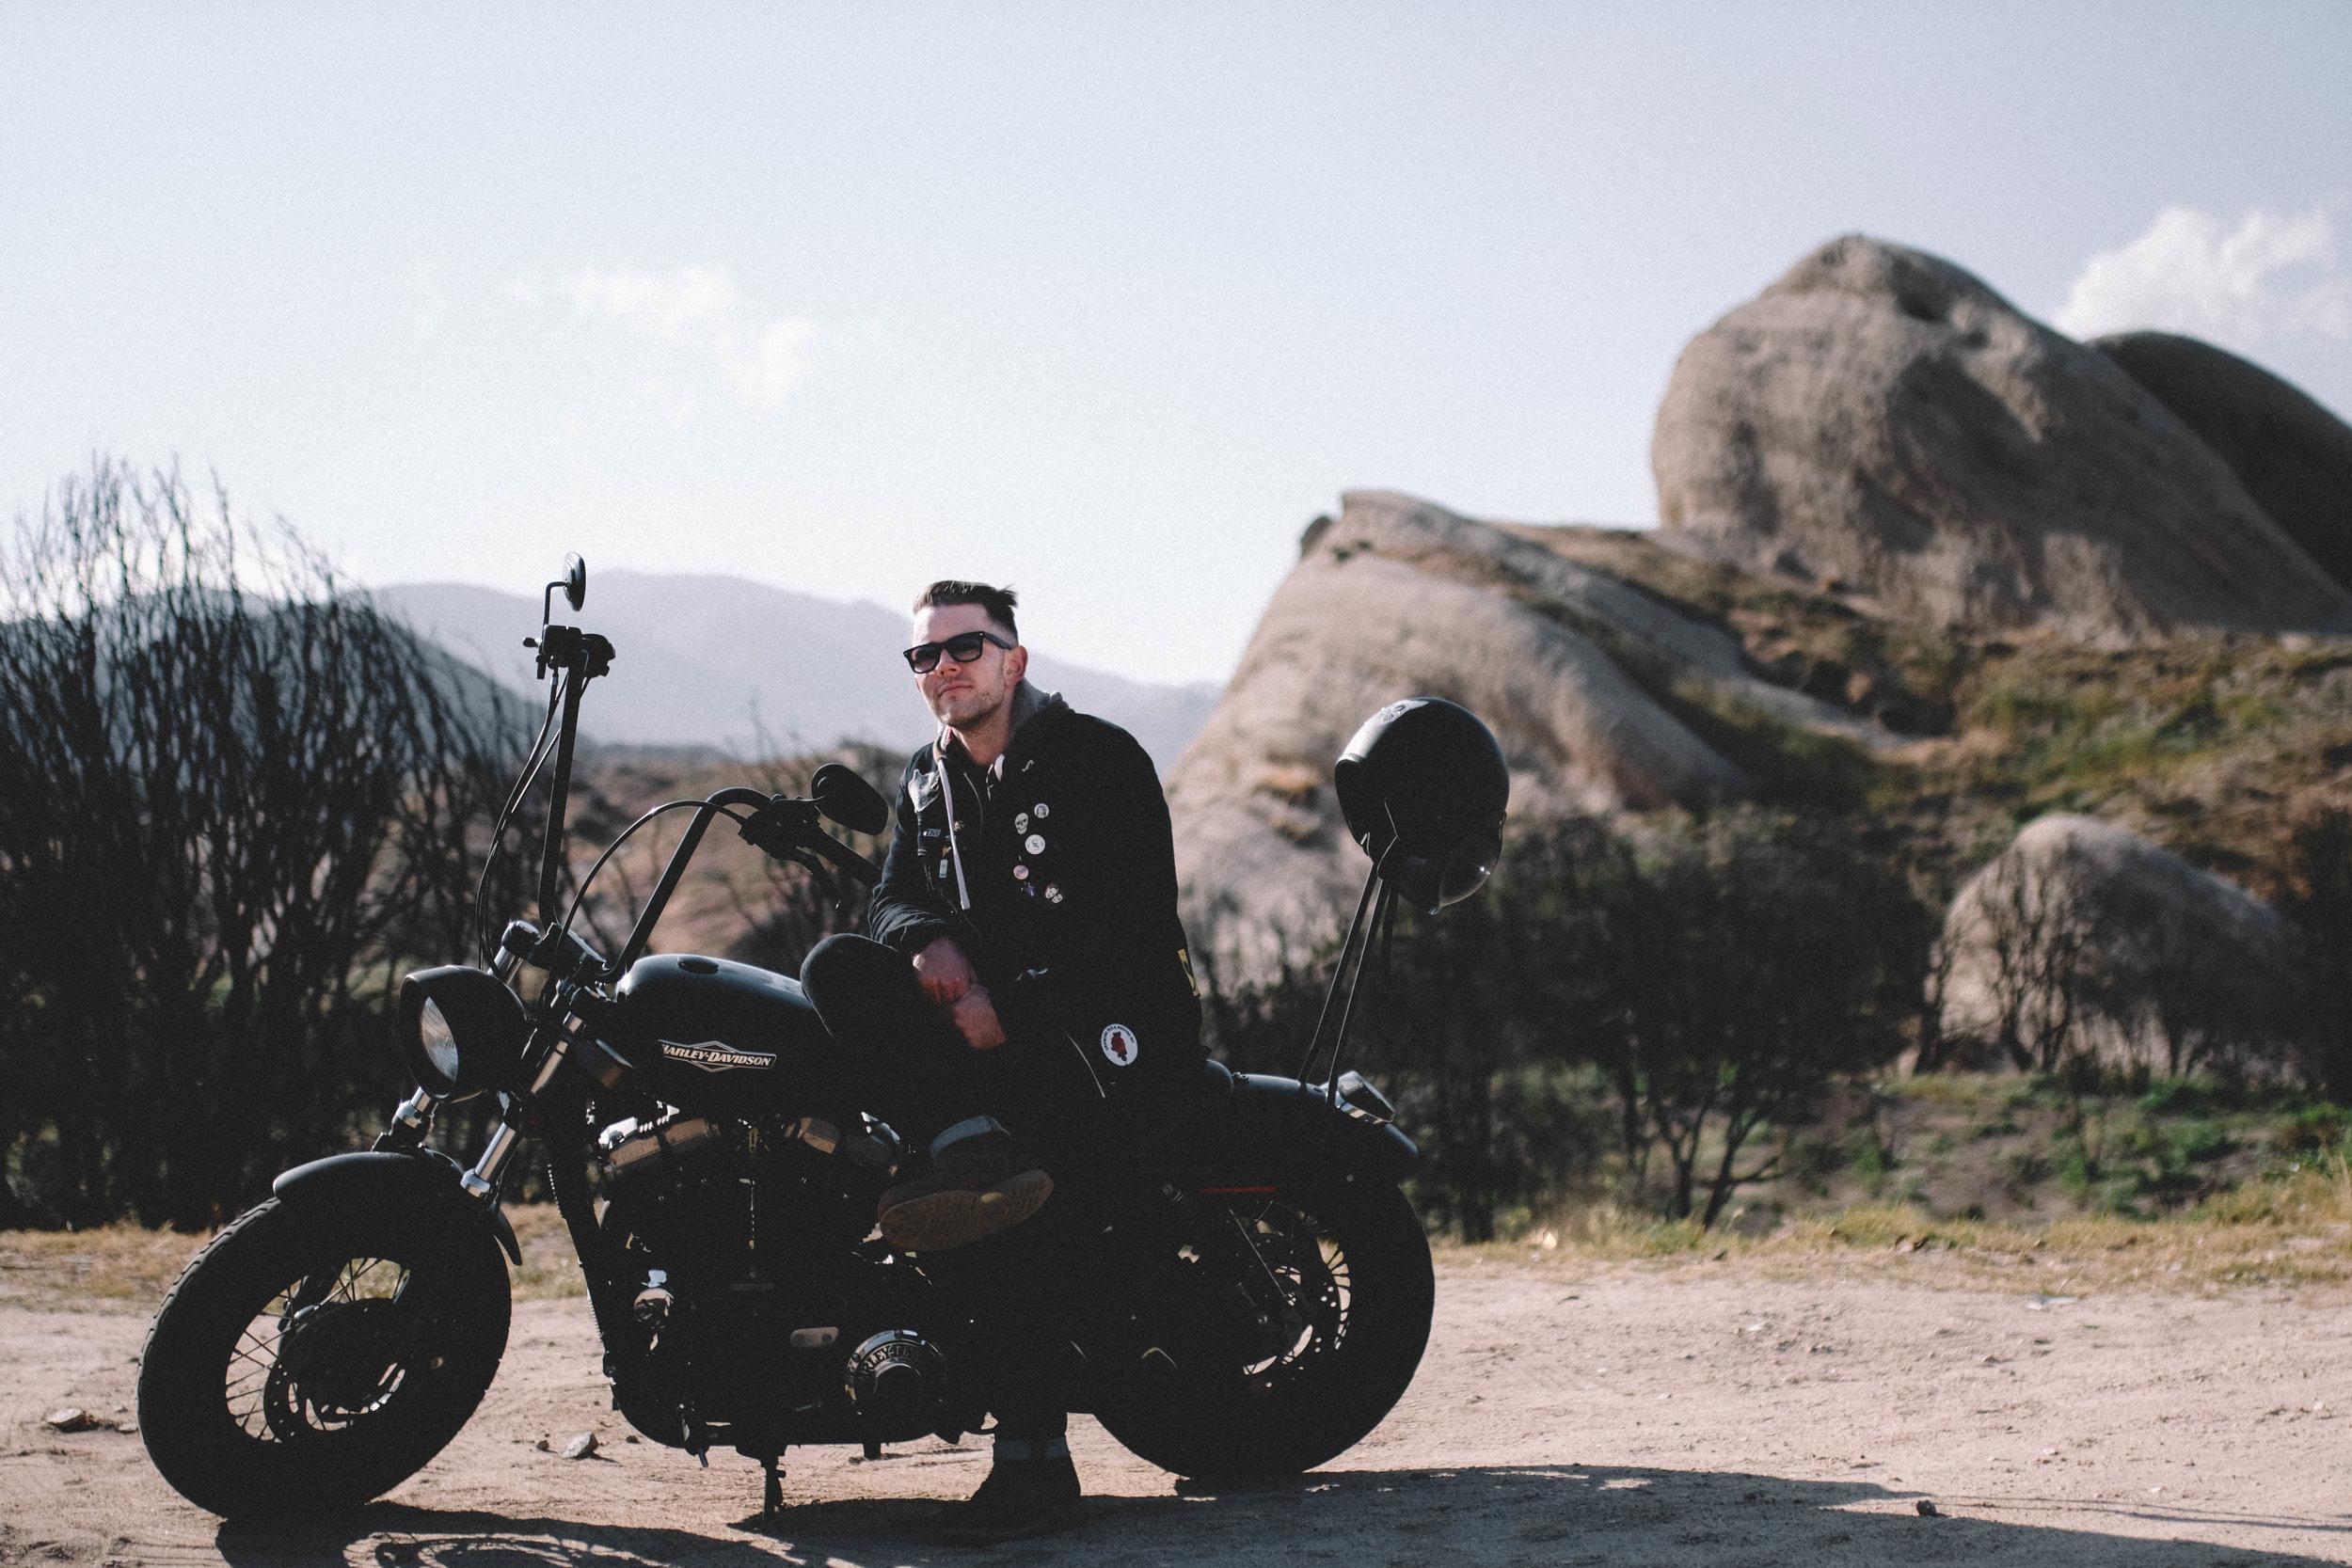 hot biker boy - SamErica Studios